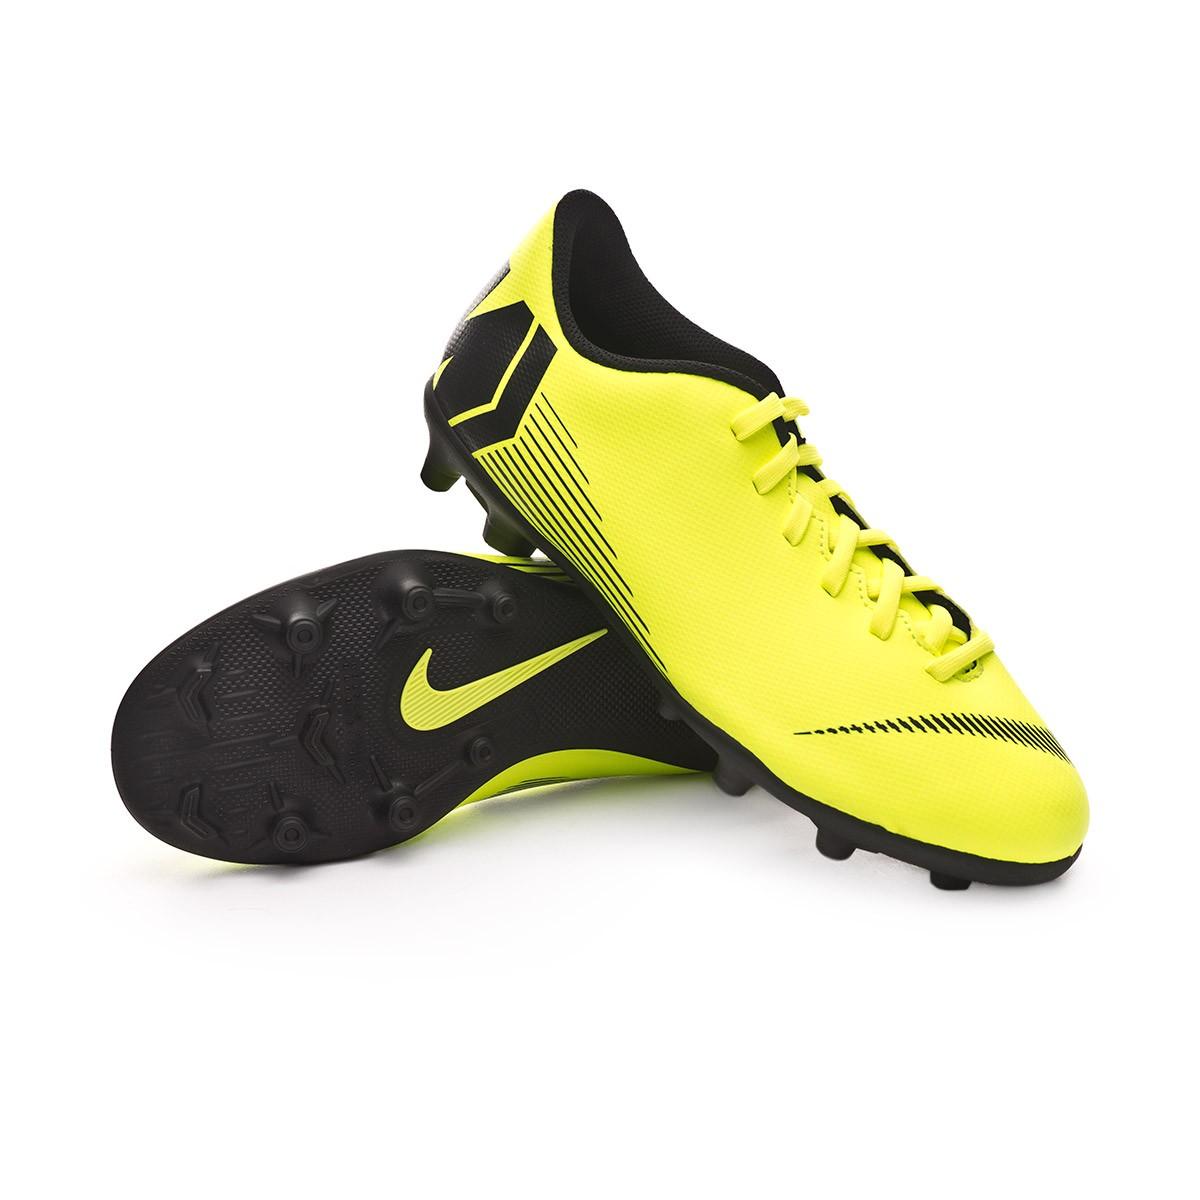 dc93ce54ec0 Nike Kids Mercurial Vapor XII Club MG Football Boots. Volt-Black ...